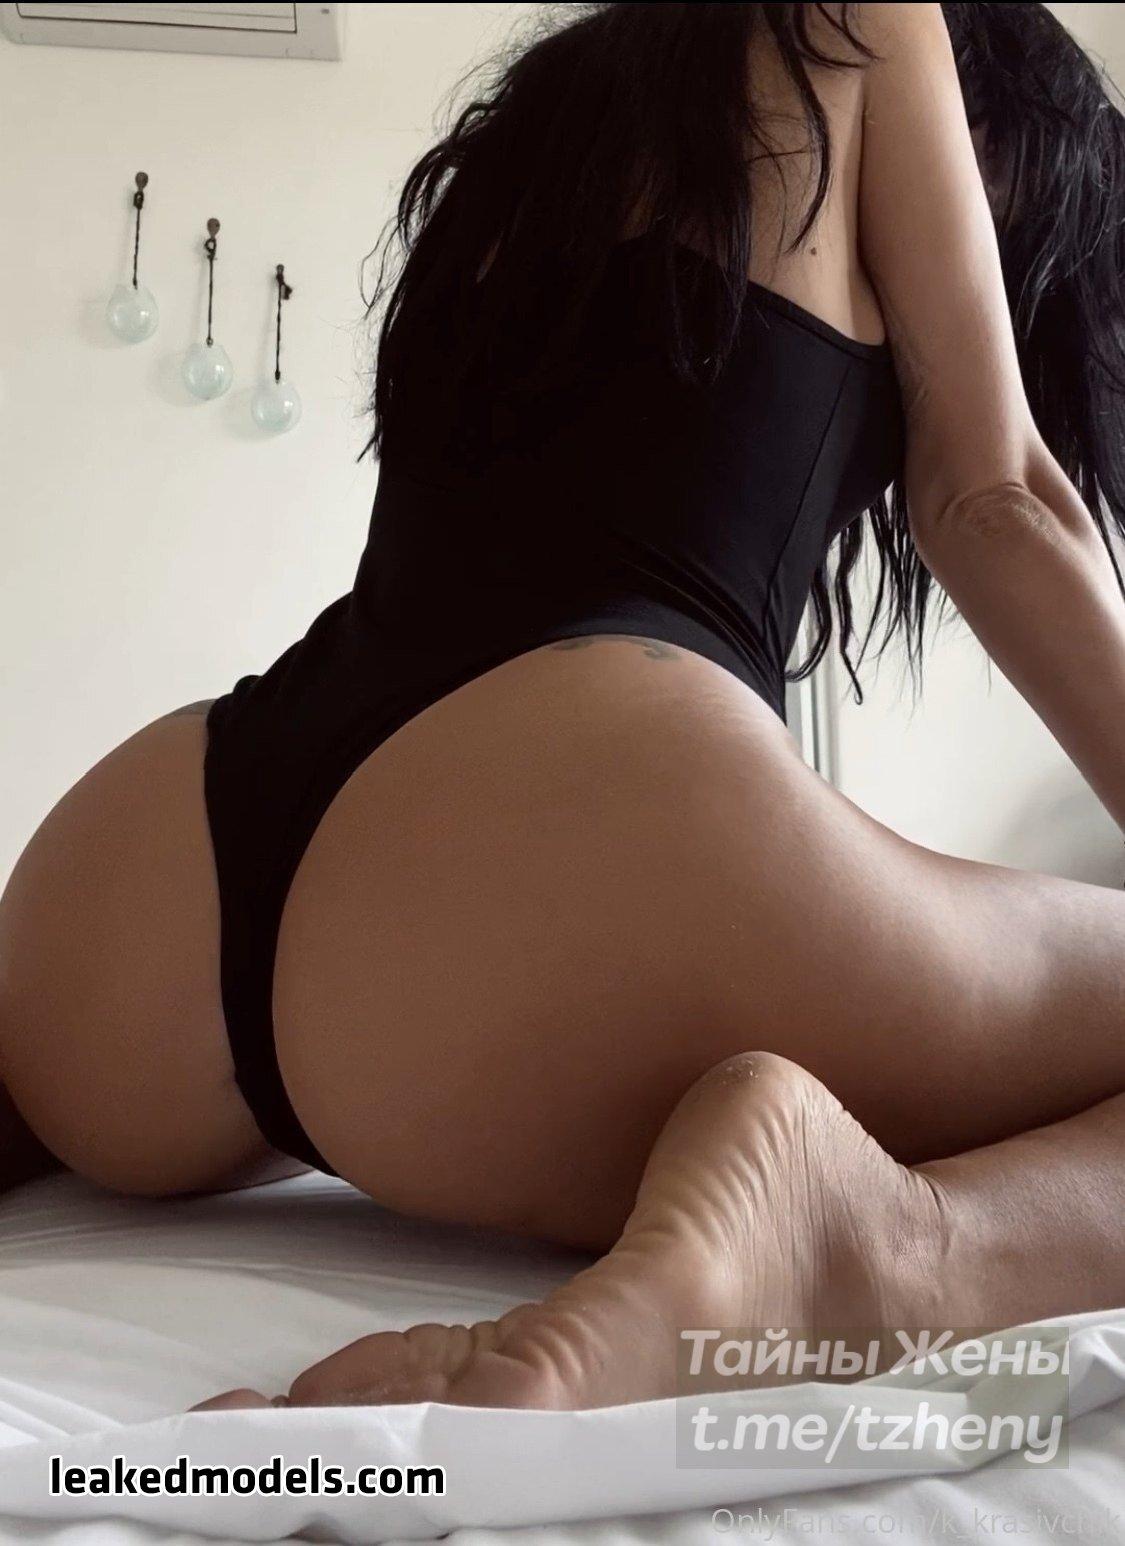 Ksusha Krasivchik – krasivchik_ksusha OnlyFans Nude Leaks (27 Photos)